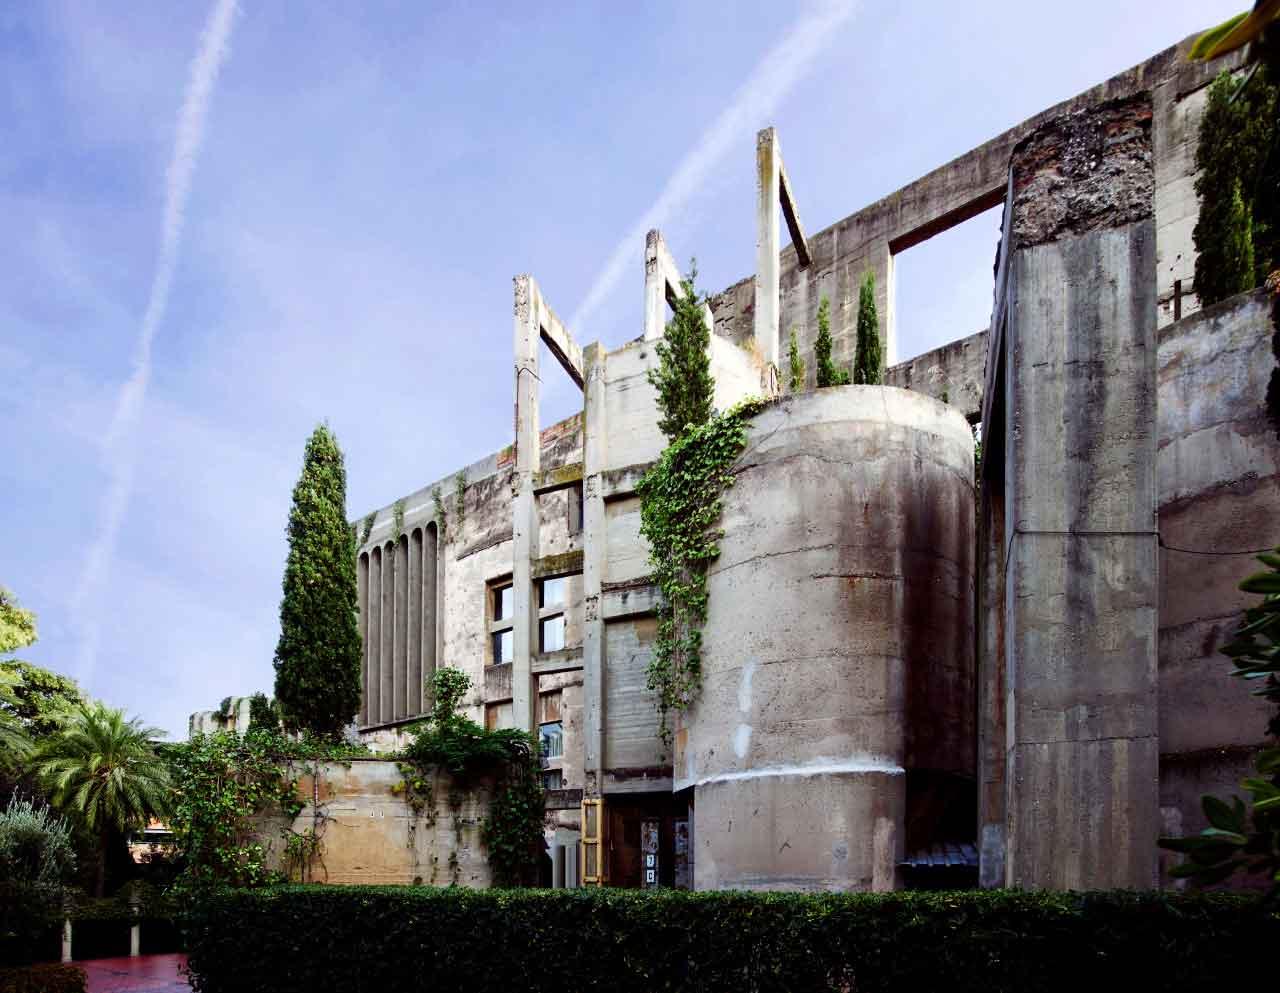 Superhouse by Karen McCartney, Photo by Richard Powers | Yellowtrace